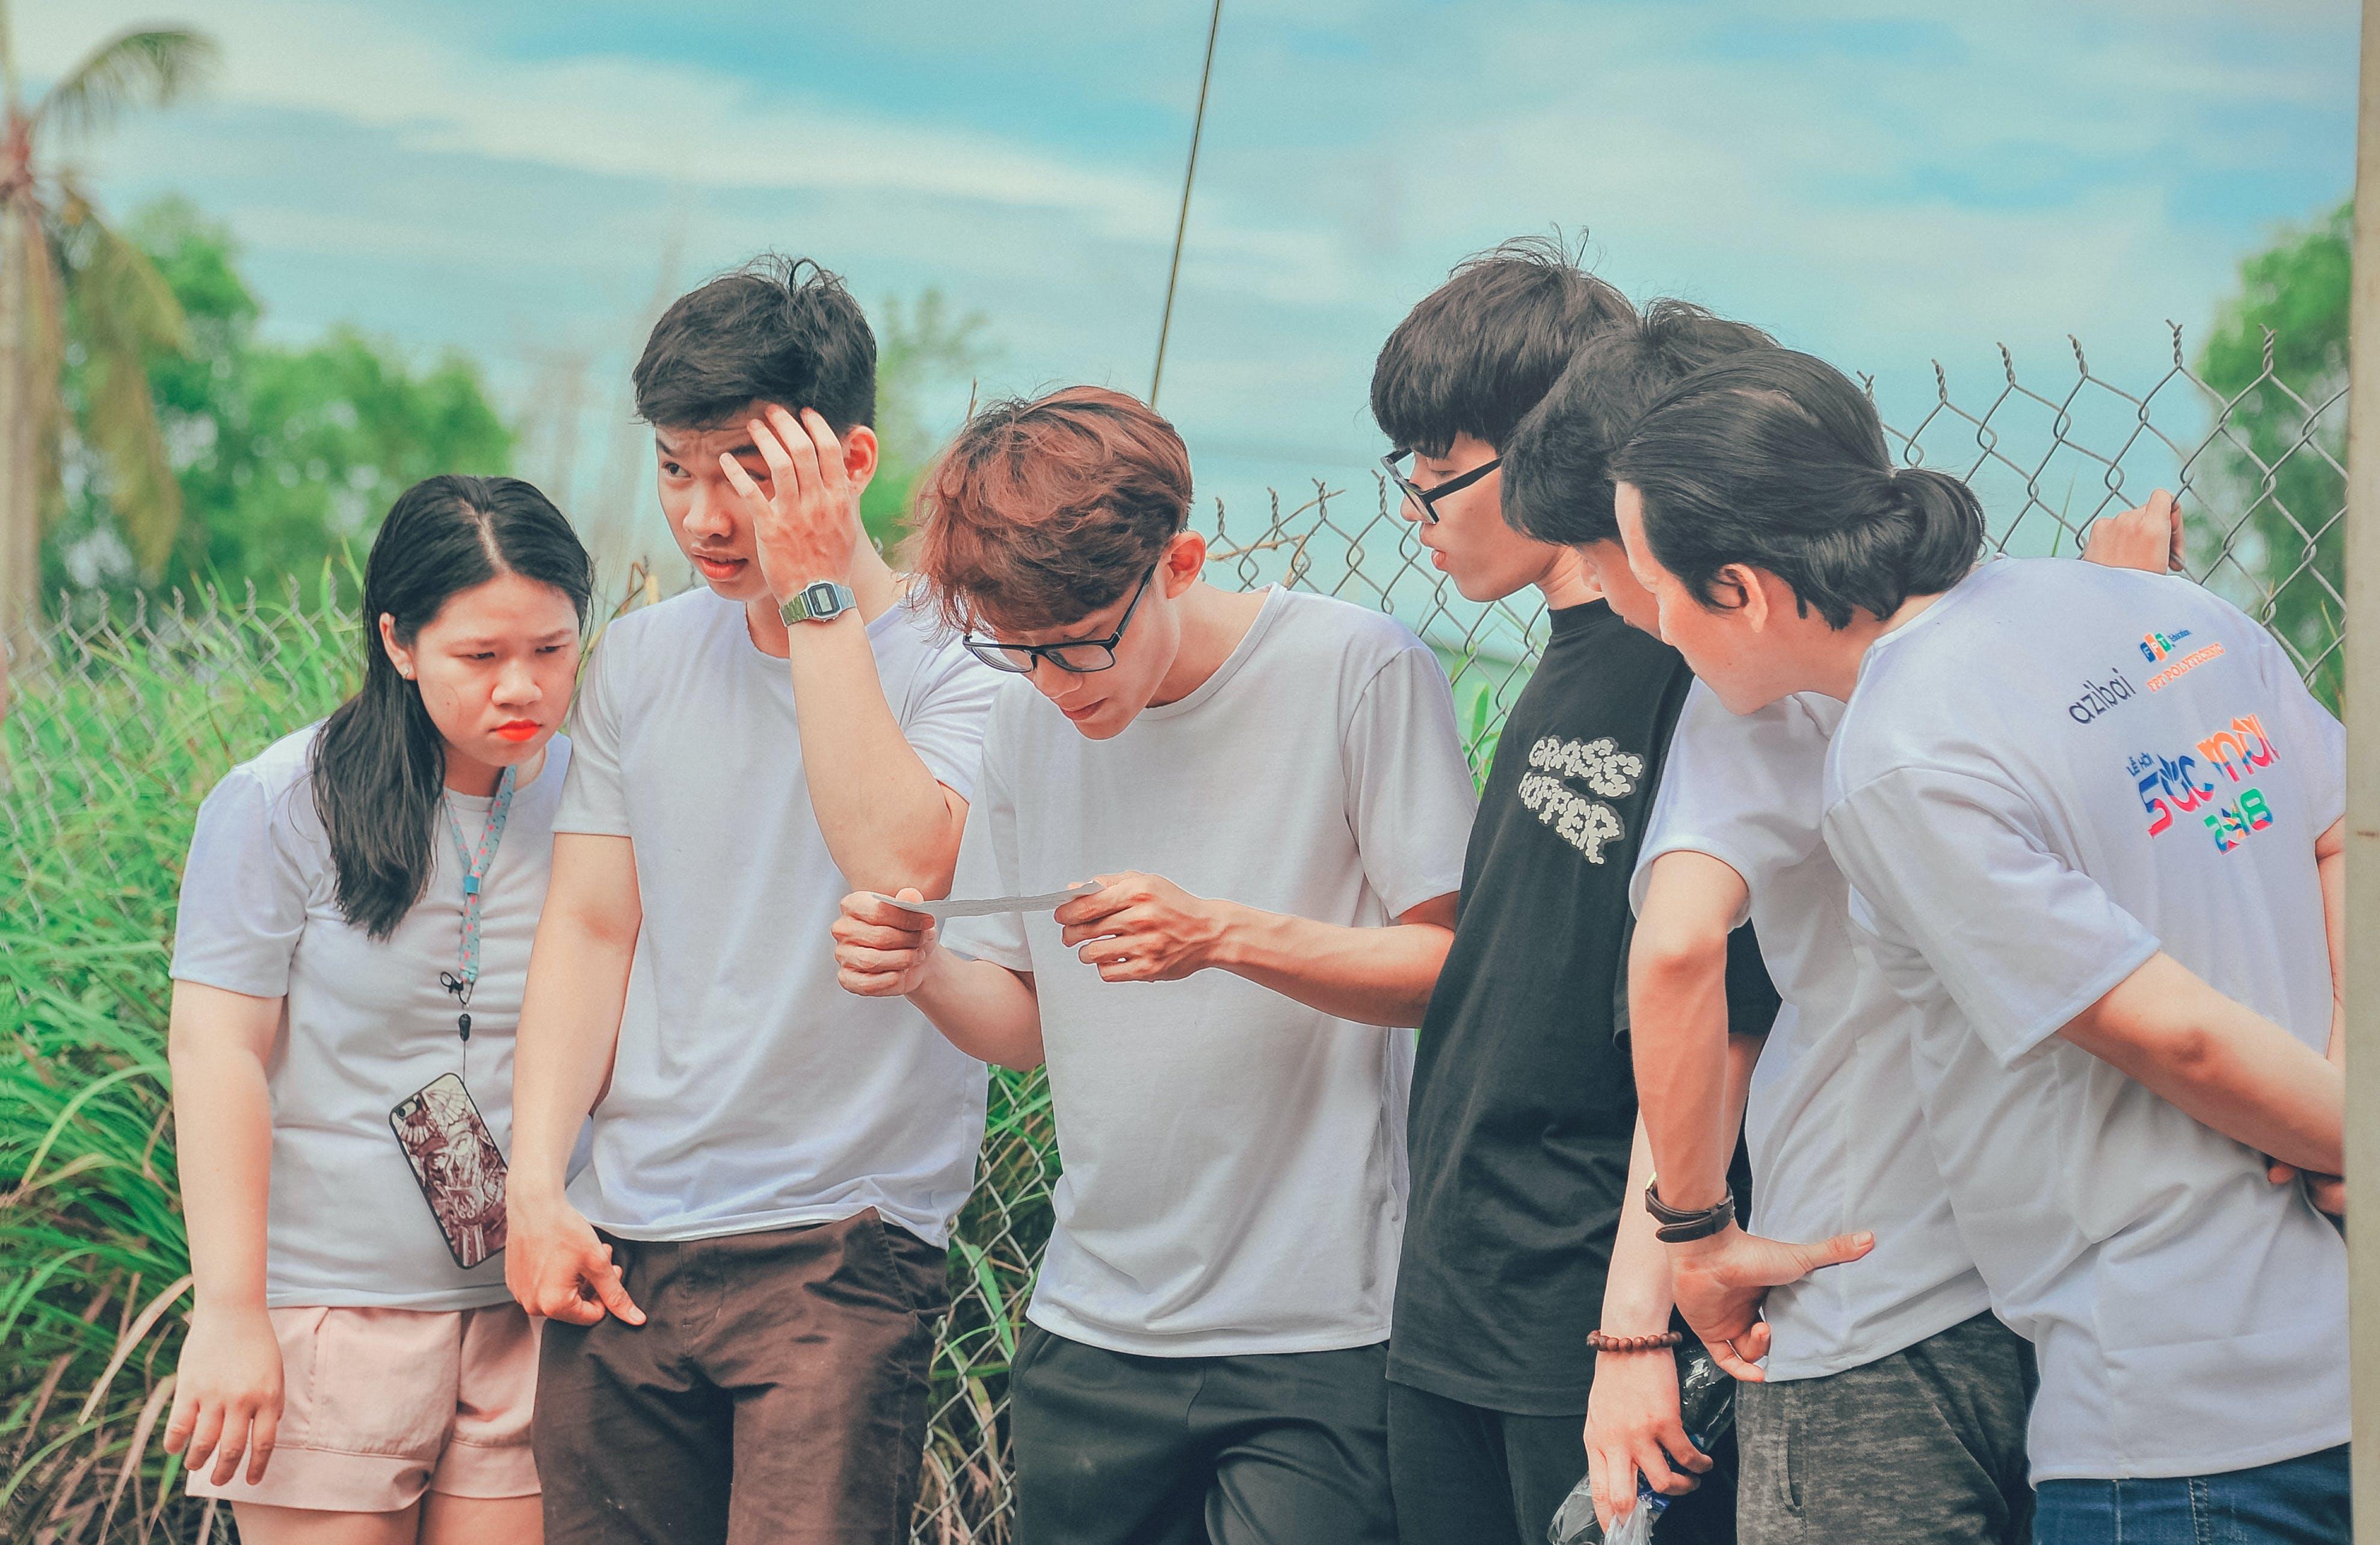 Five Men and 1 Women Wearing Crew-neck T-shirts at Daytime